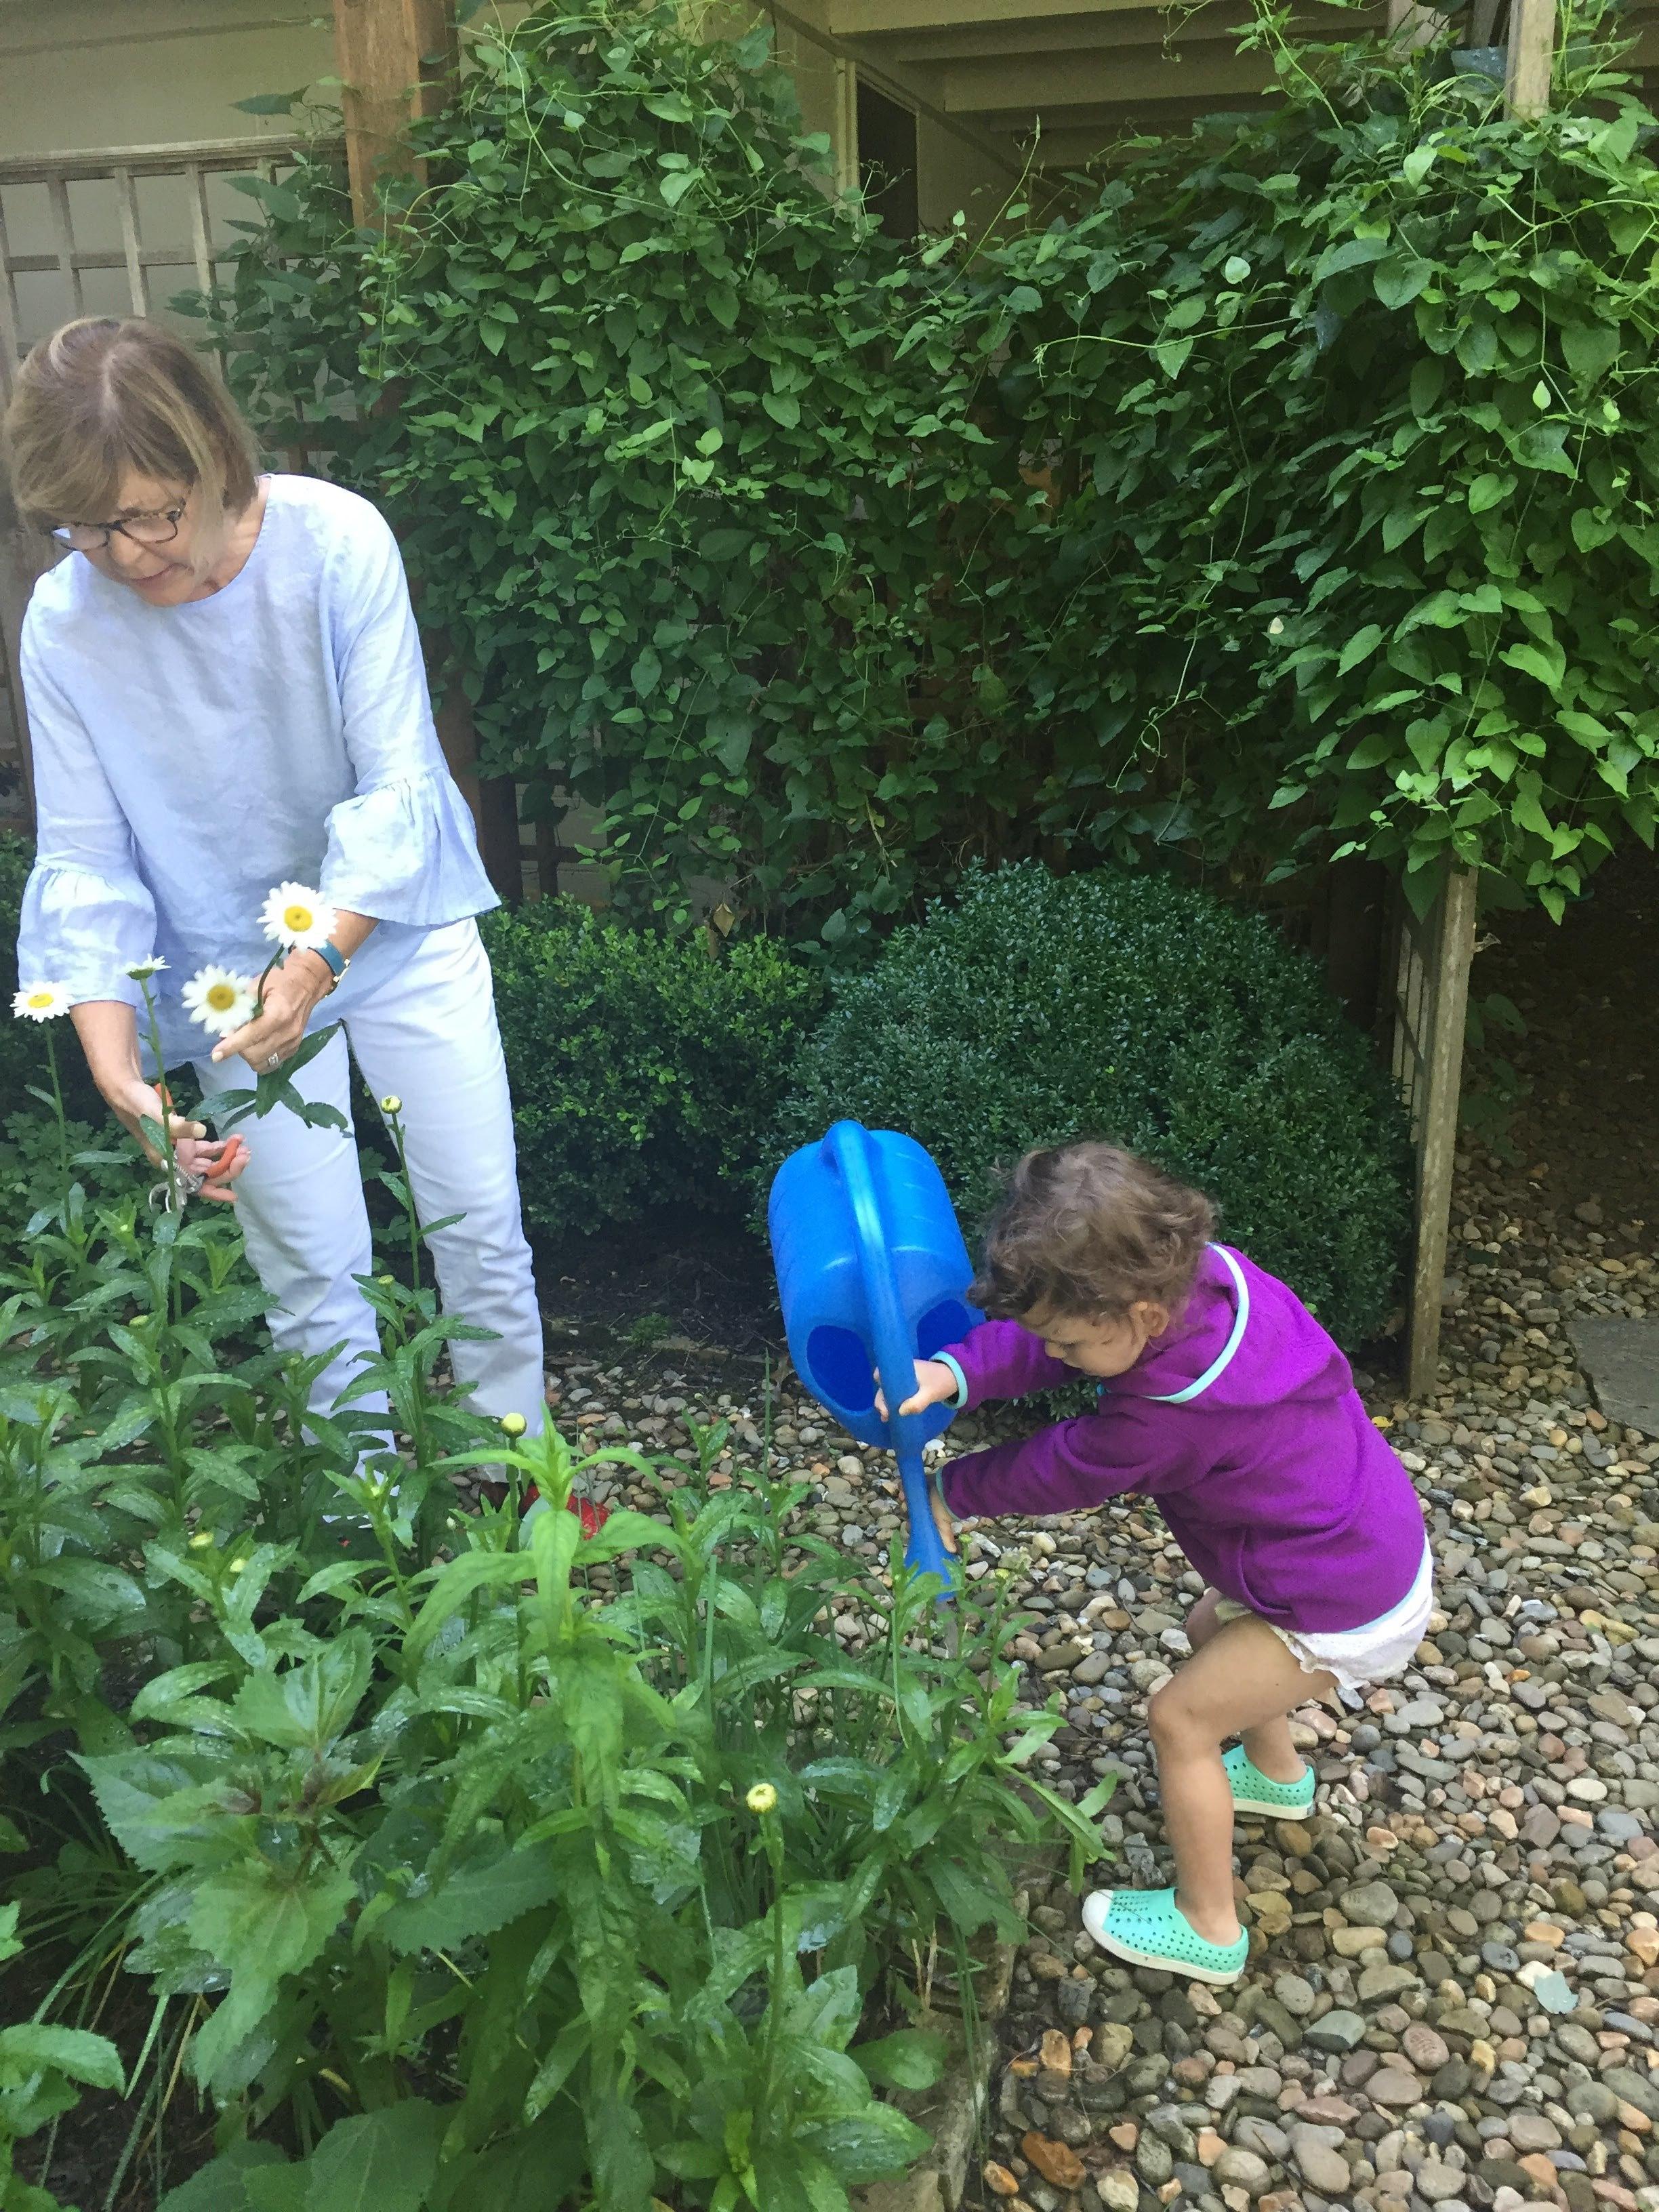 Helping Mimi water the garden